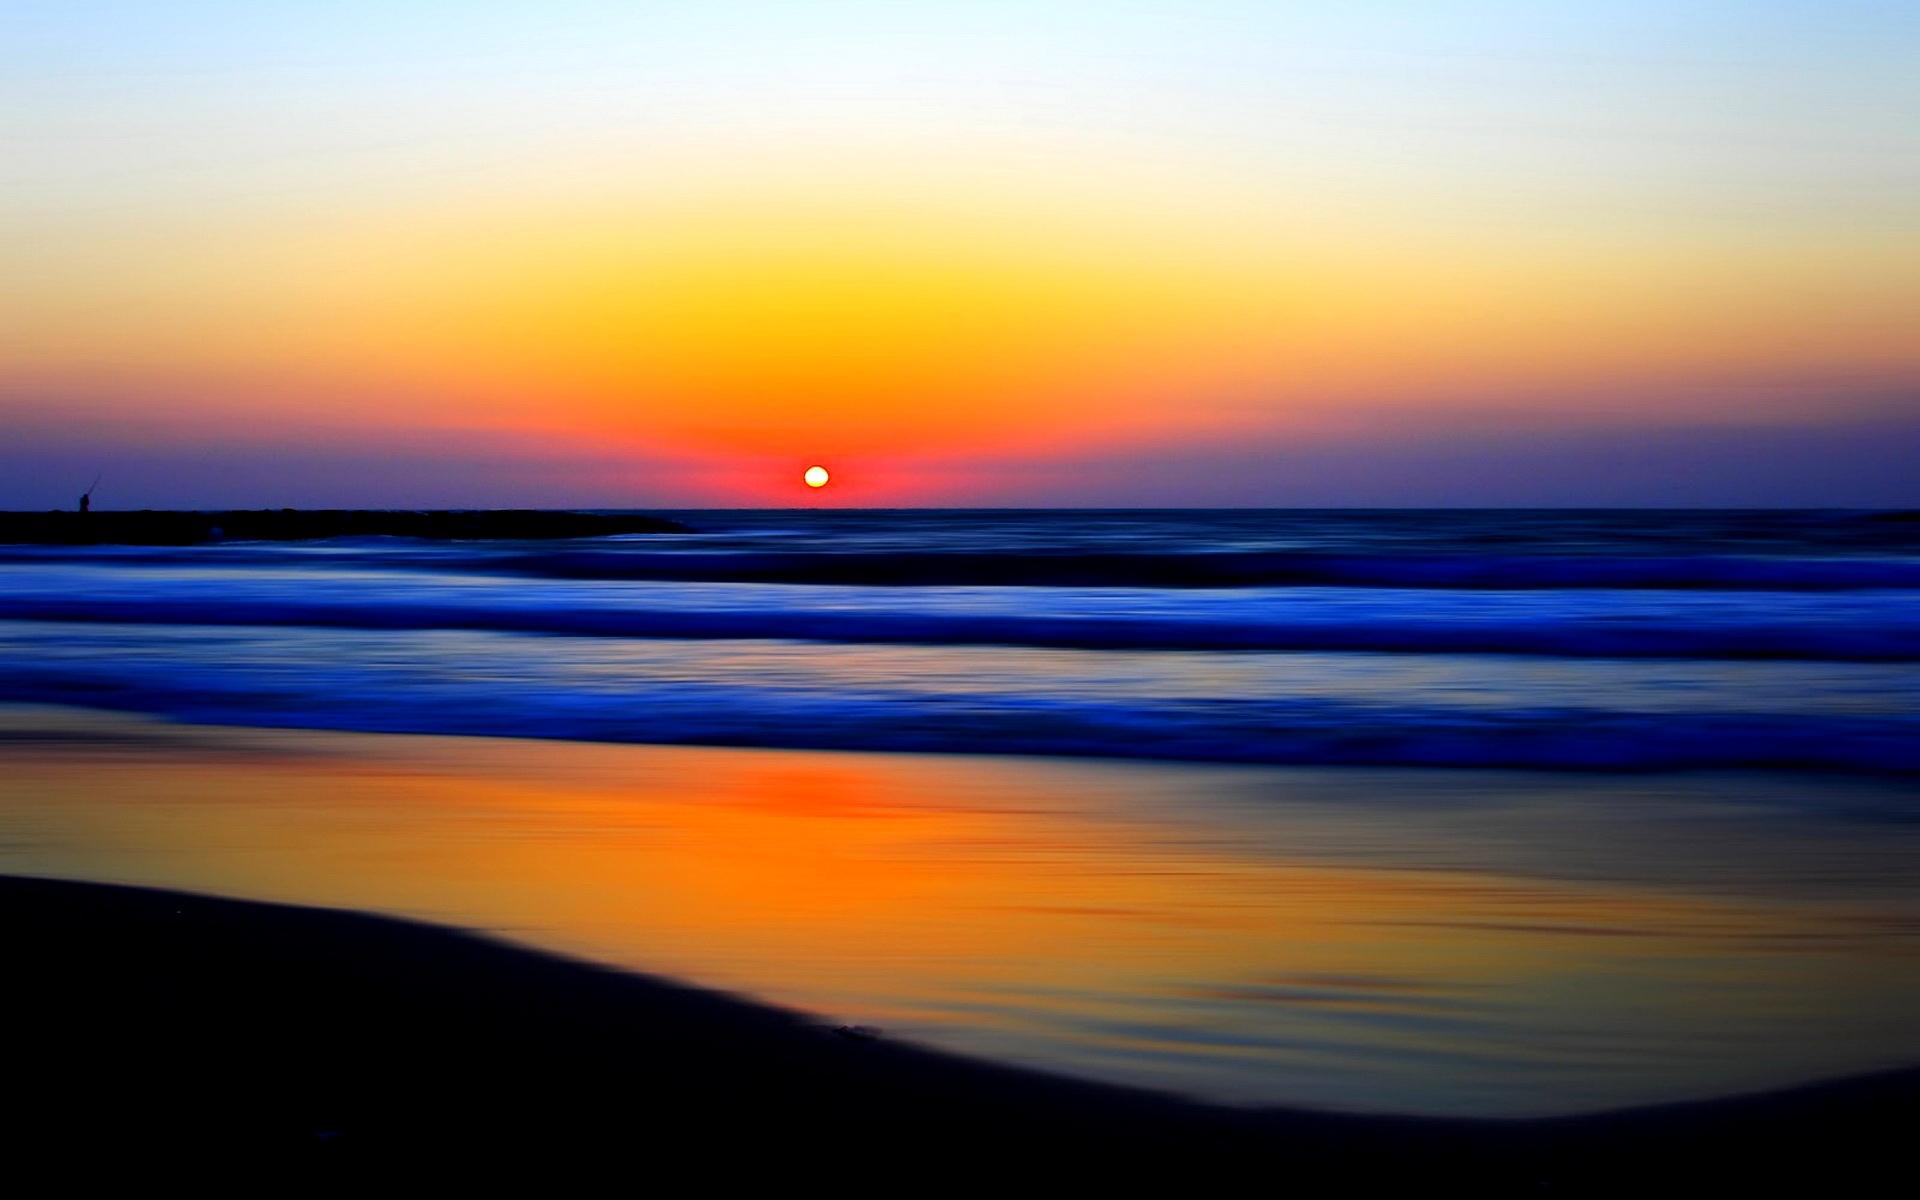 beach sunset wallpapers beautiful